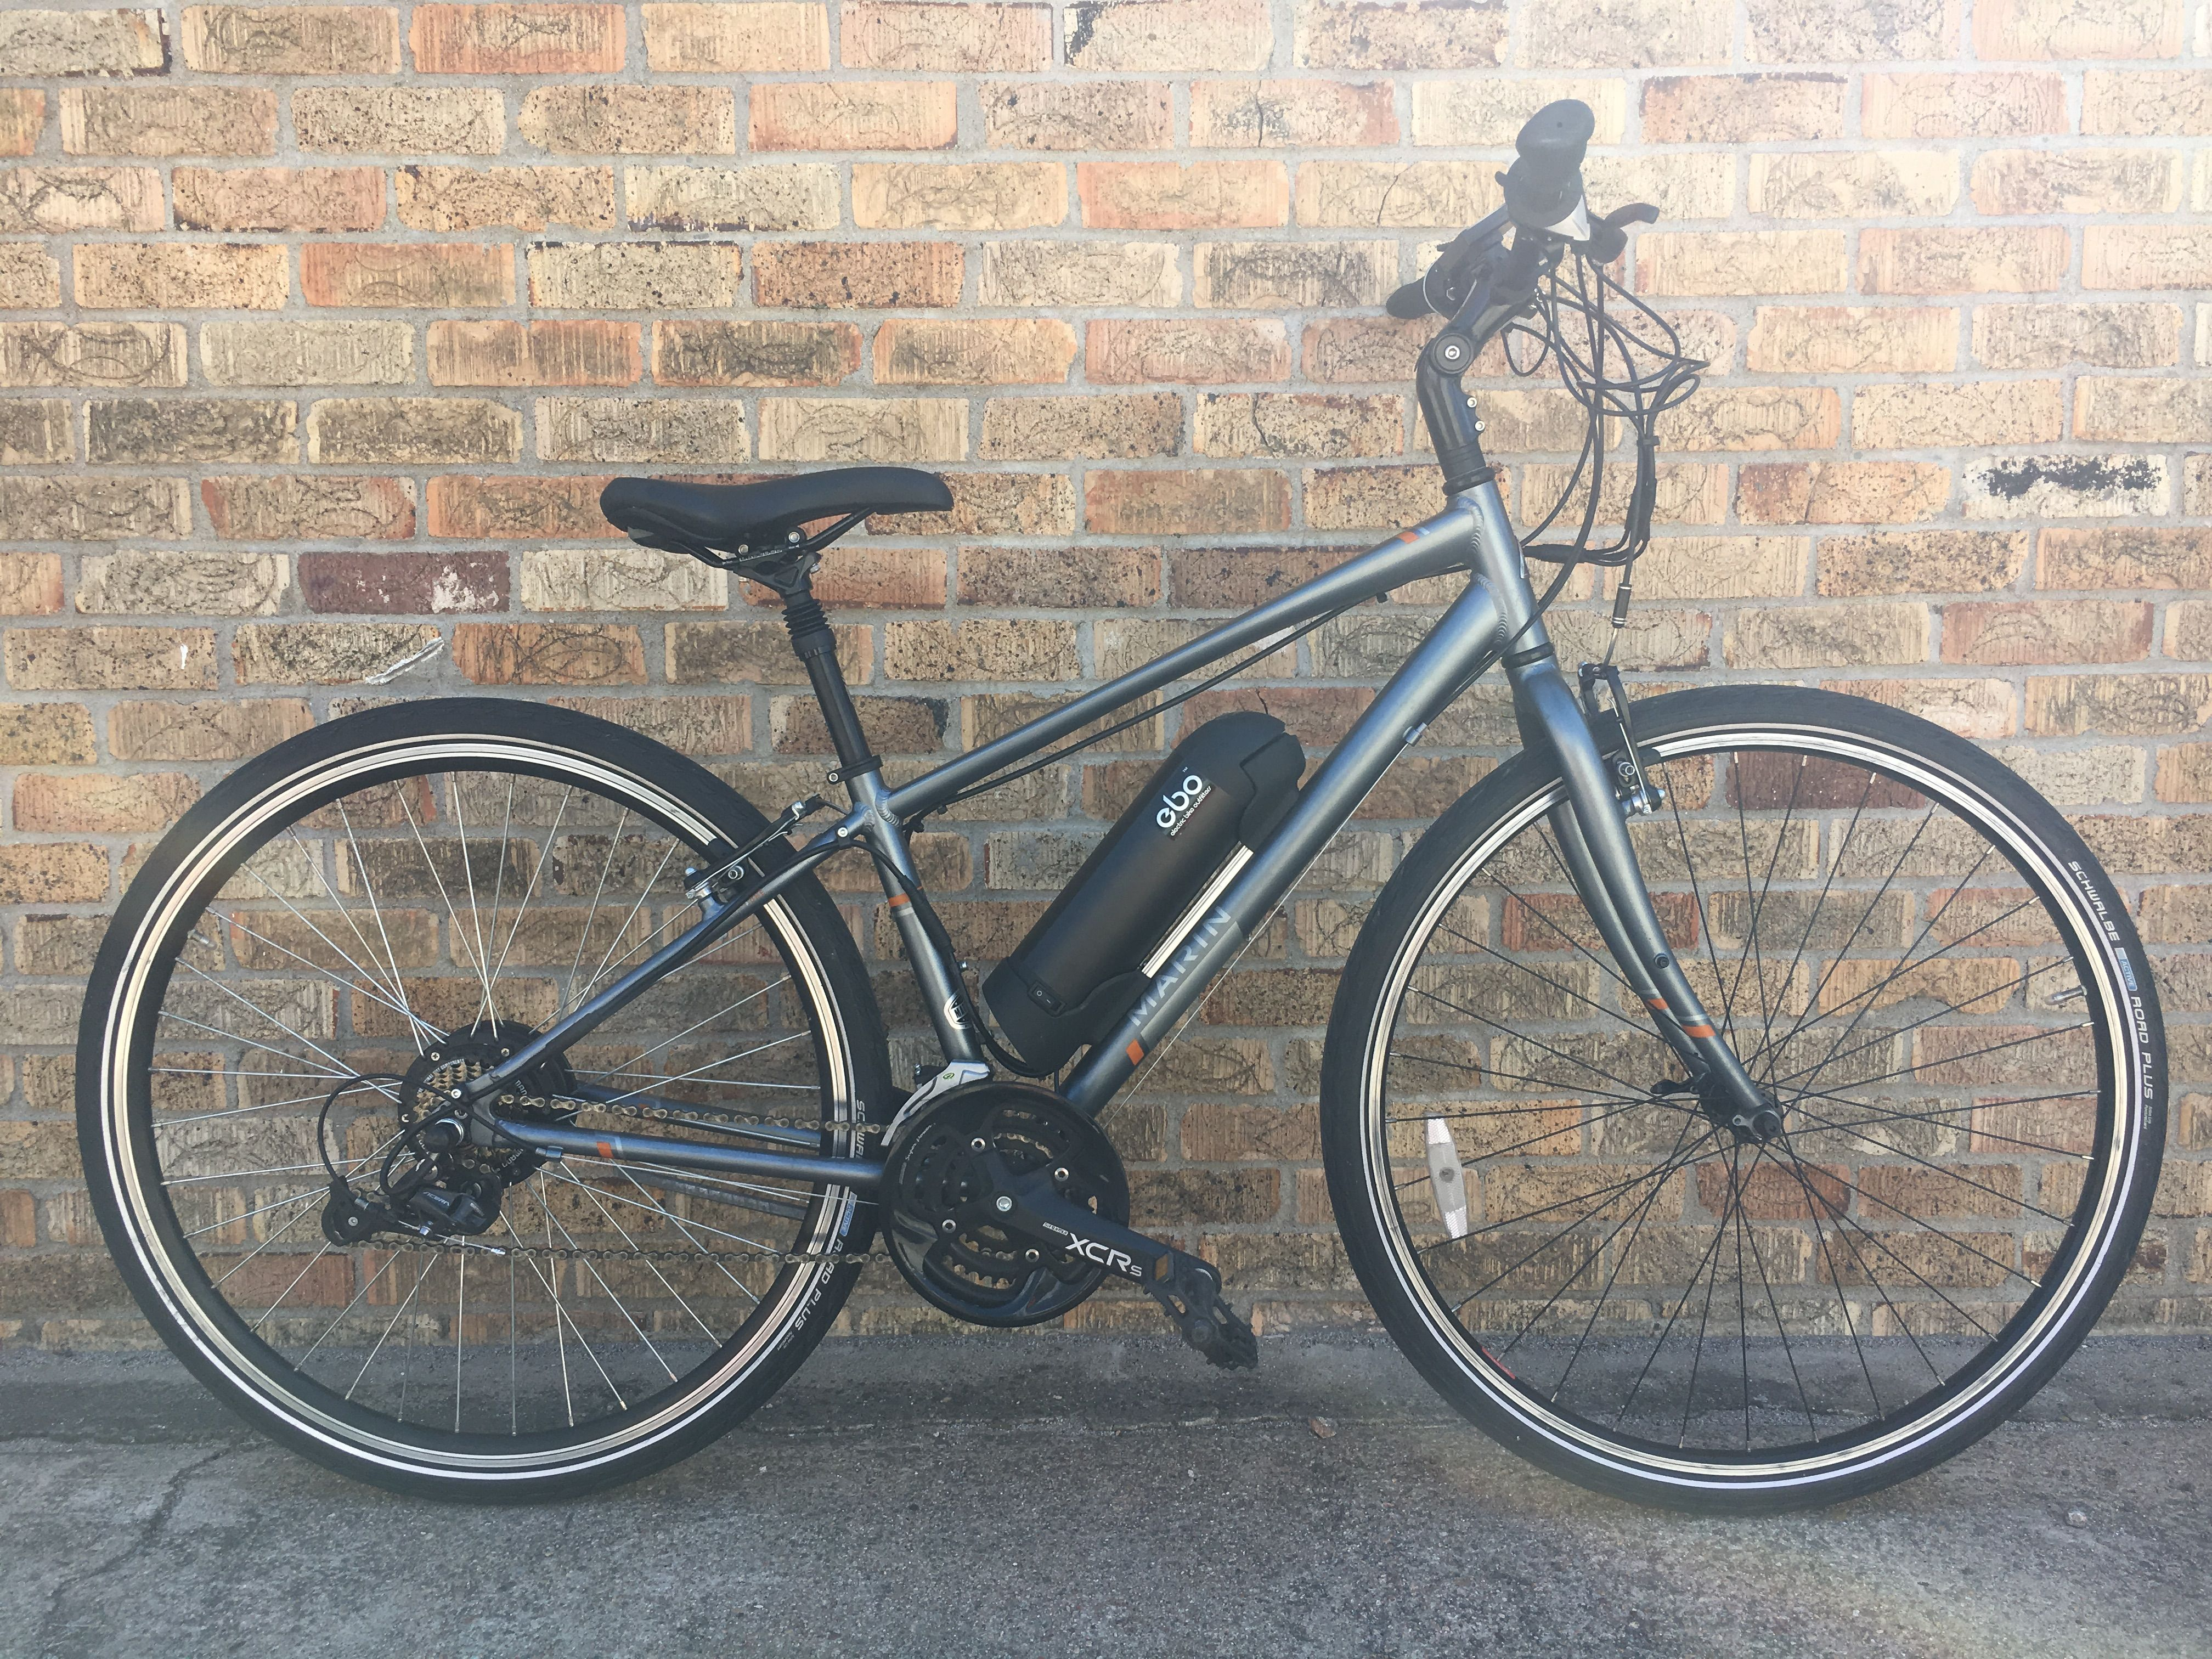 Ebo Phantom Electric Bike Kit Installed On A Marin Larkspur Cs3 Electric Bike Kits Electric Bike Bike Kit